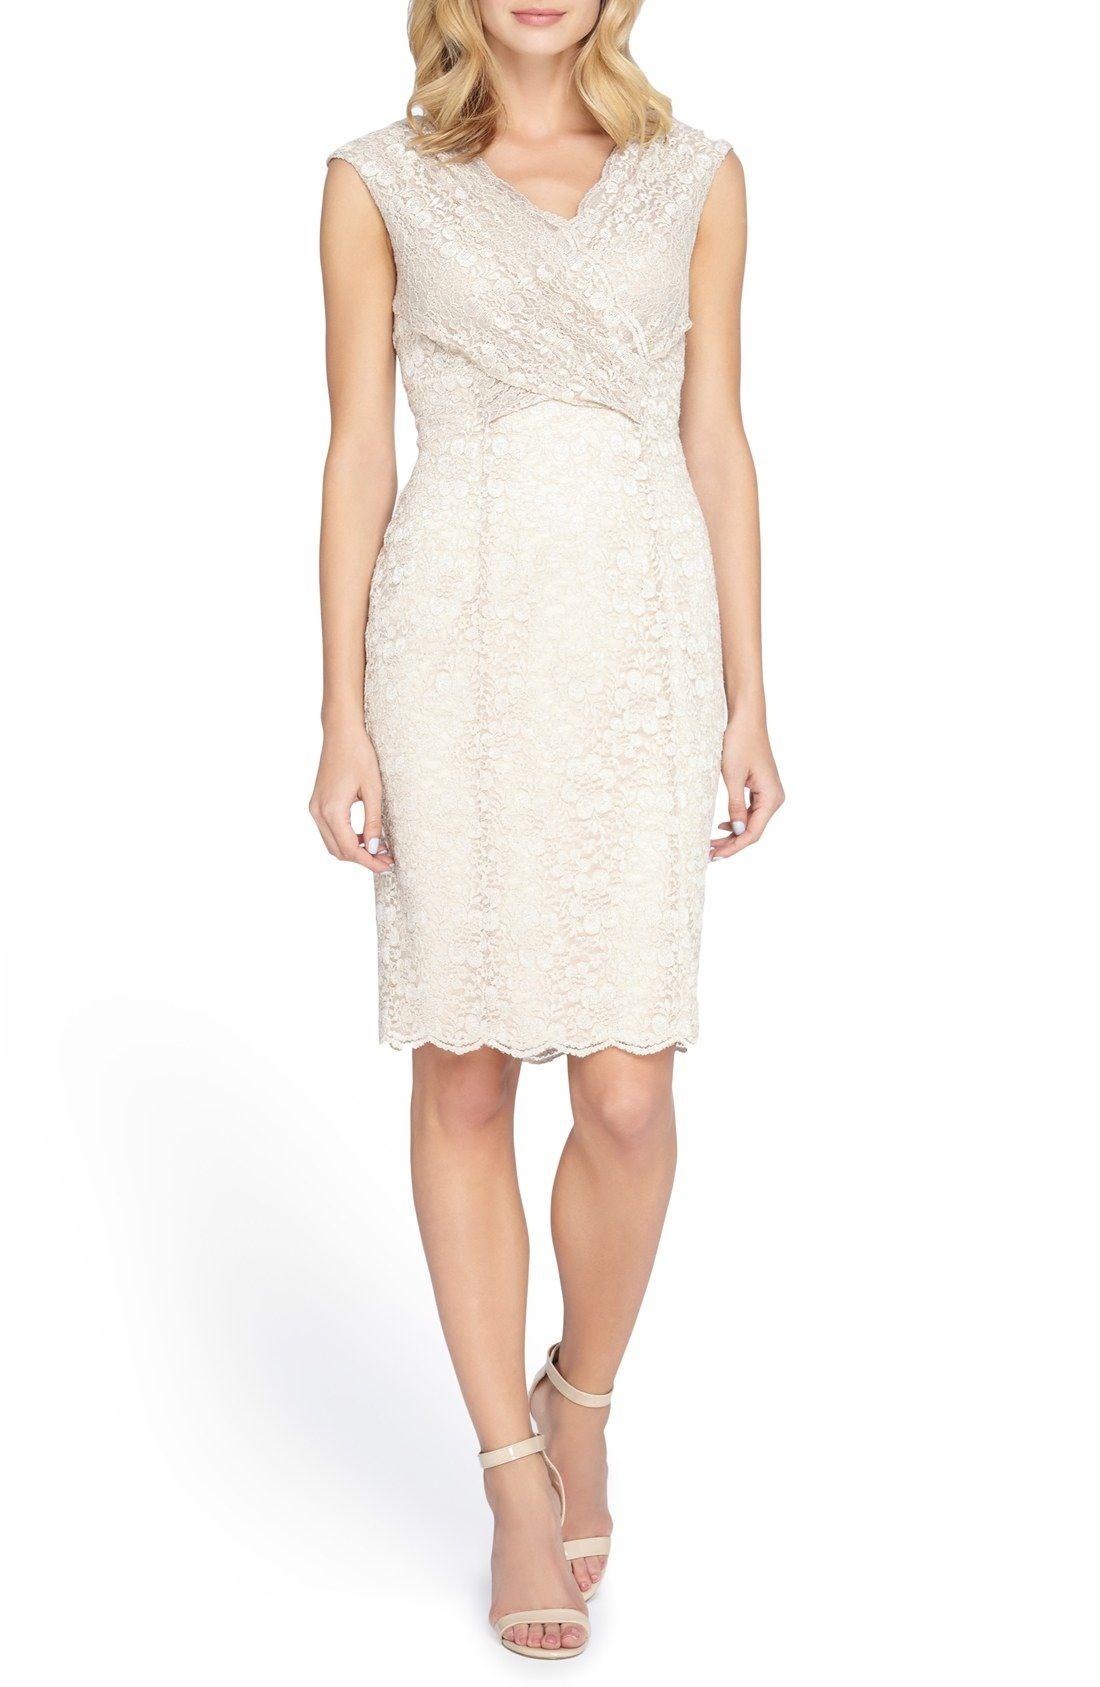 Nordstrom dresses wedding guest  Tahari Cross Front Lace Sheath Dress Regular  Dresses  Pinterest